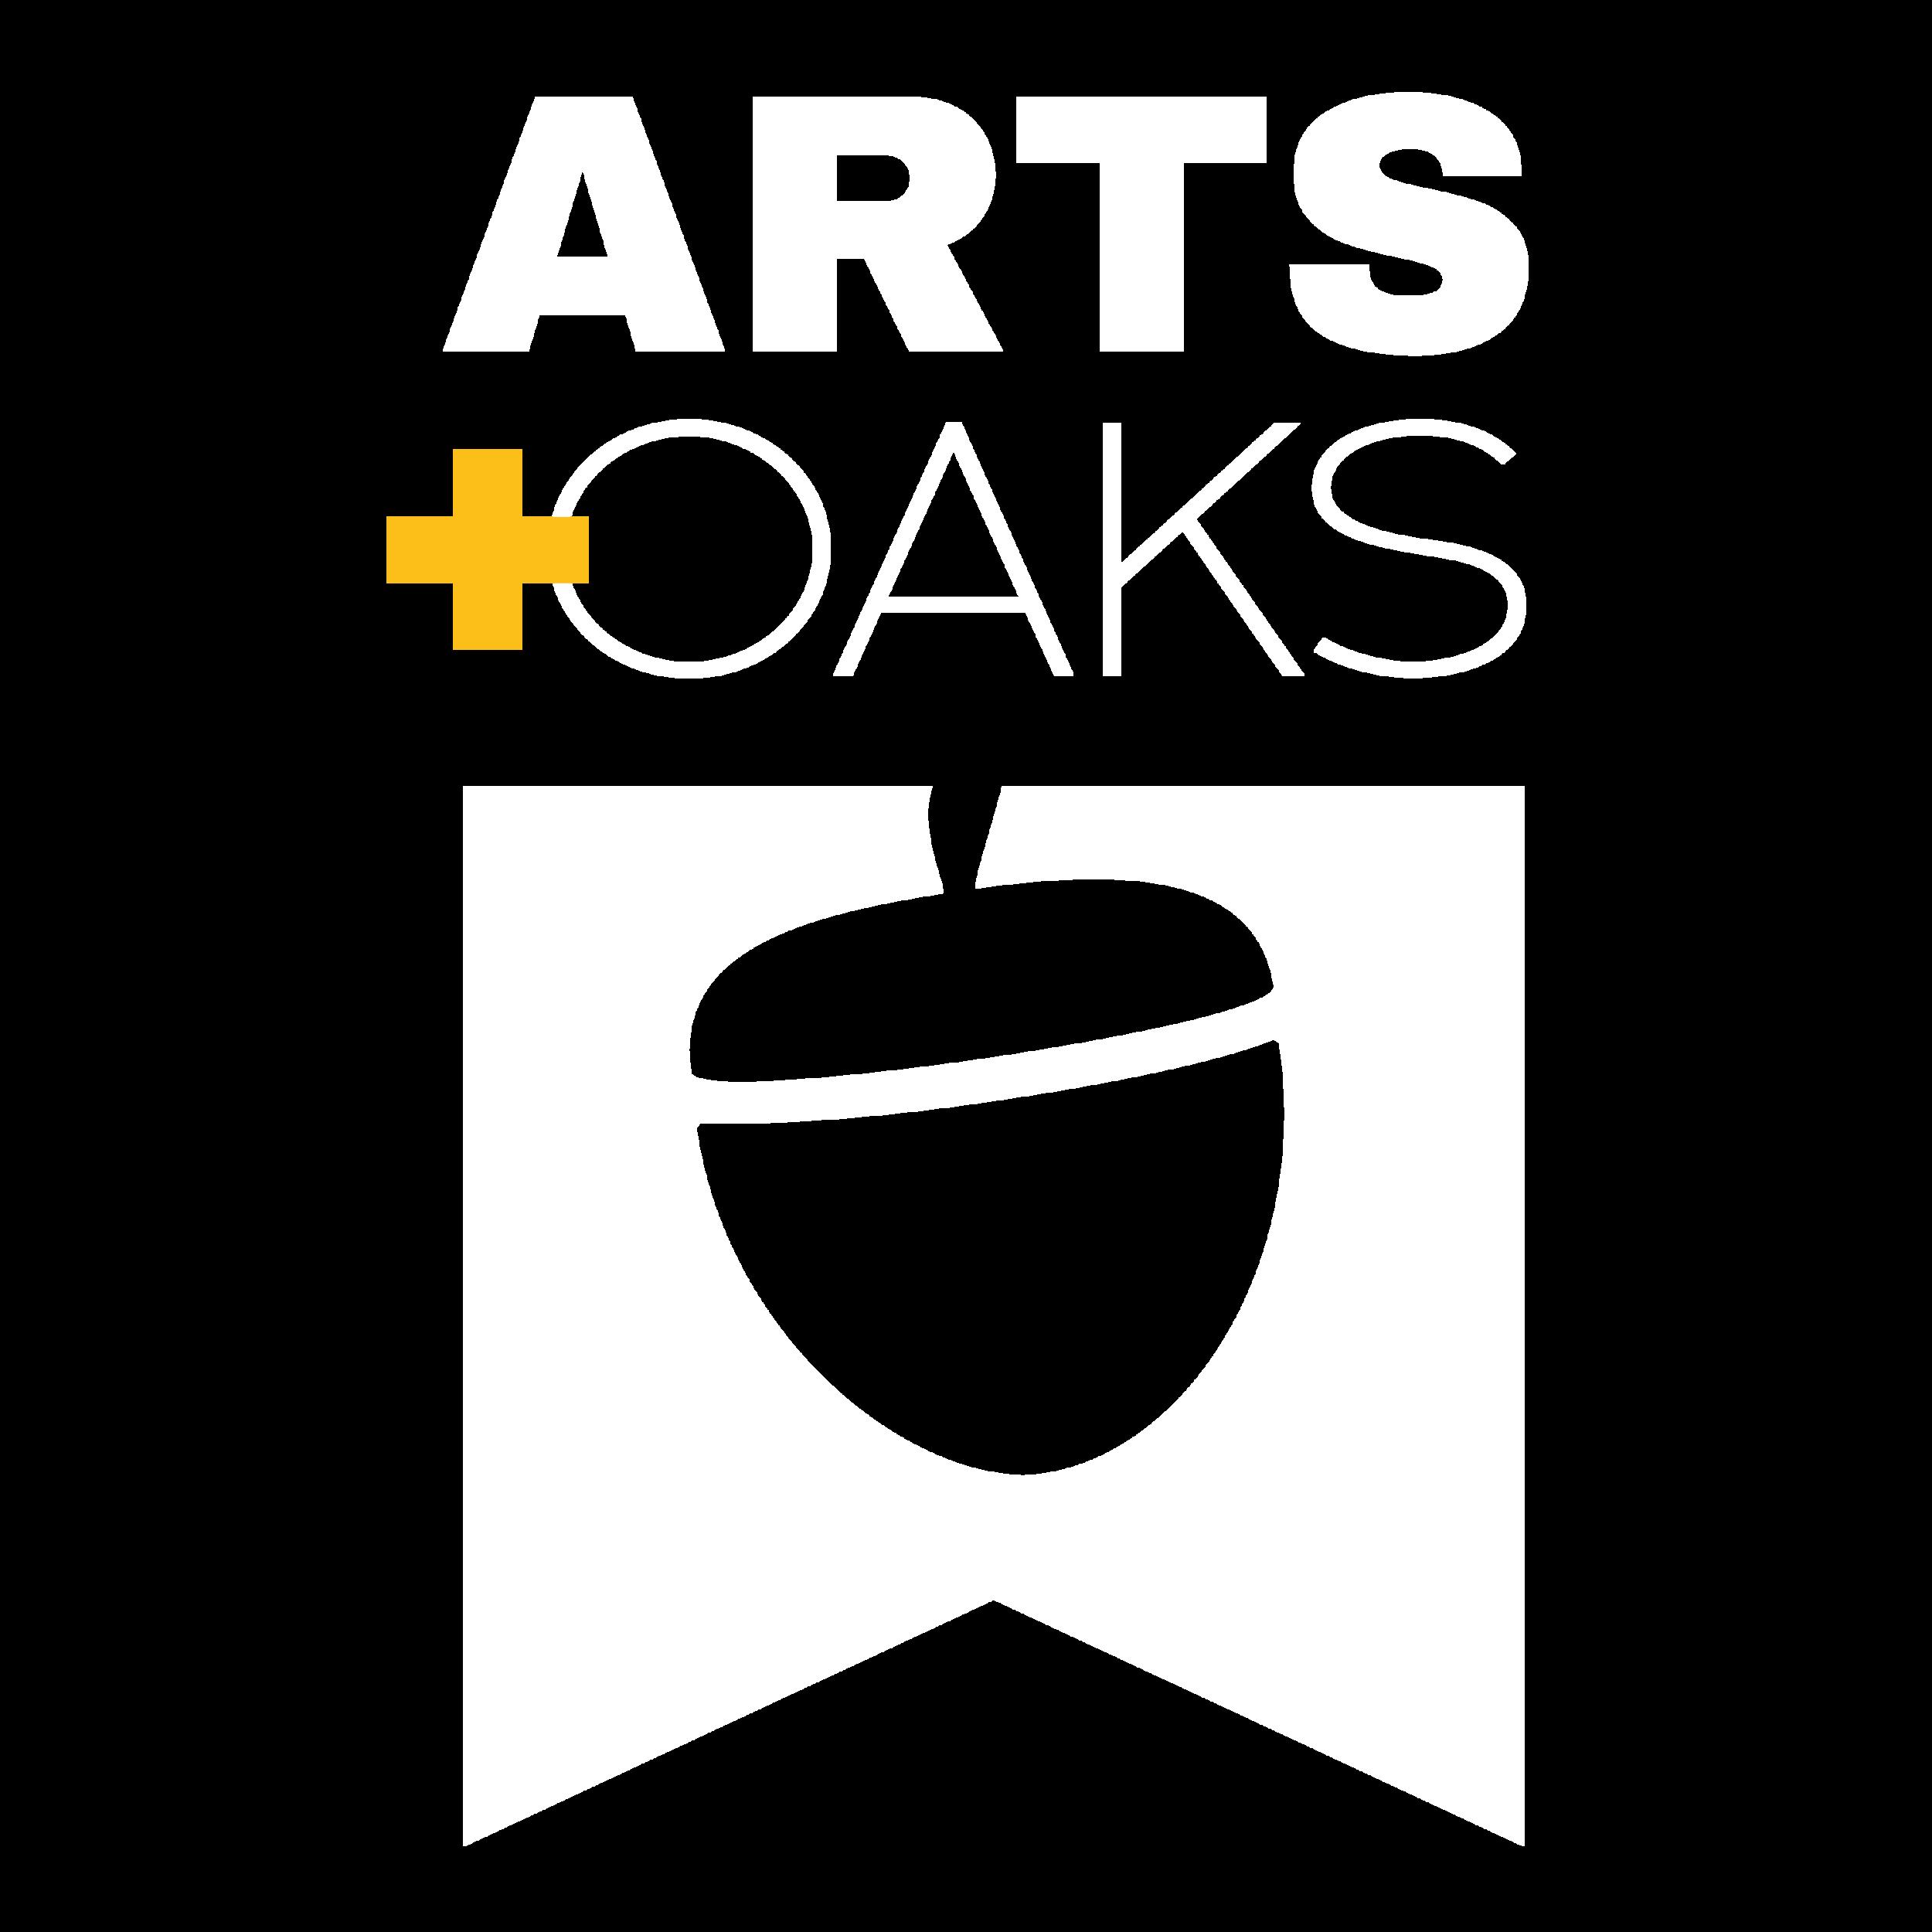 Arts and Oaks Logo - Indie book publishing - Branding - Photography - Vegan marketing_vv-11.png